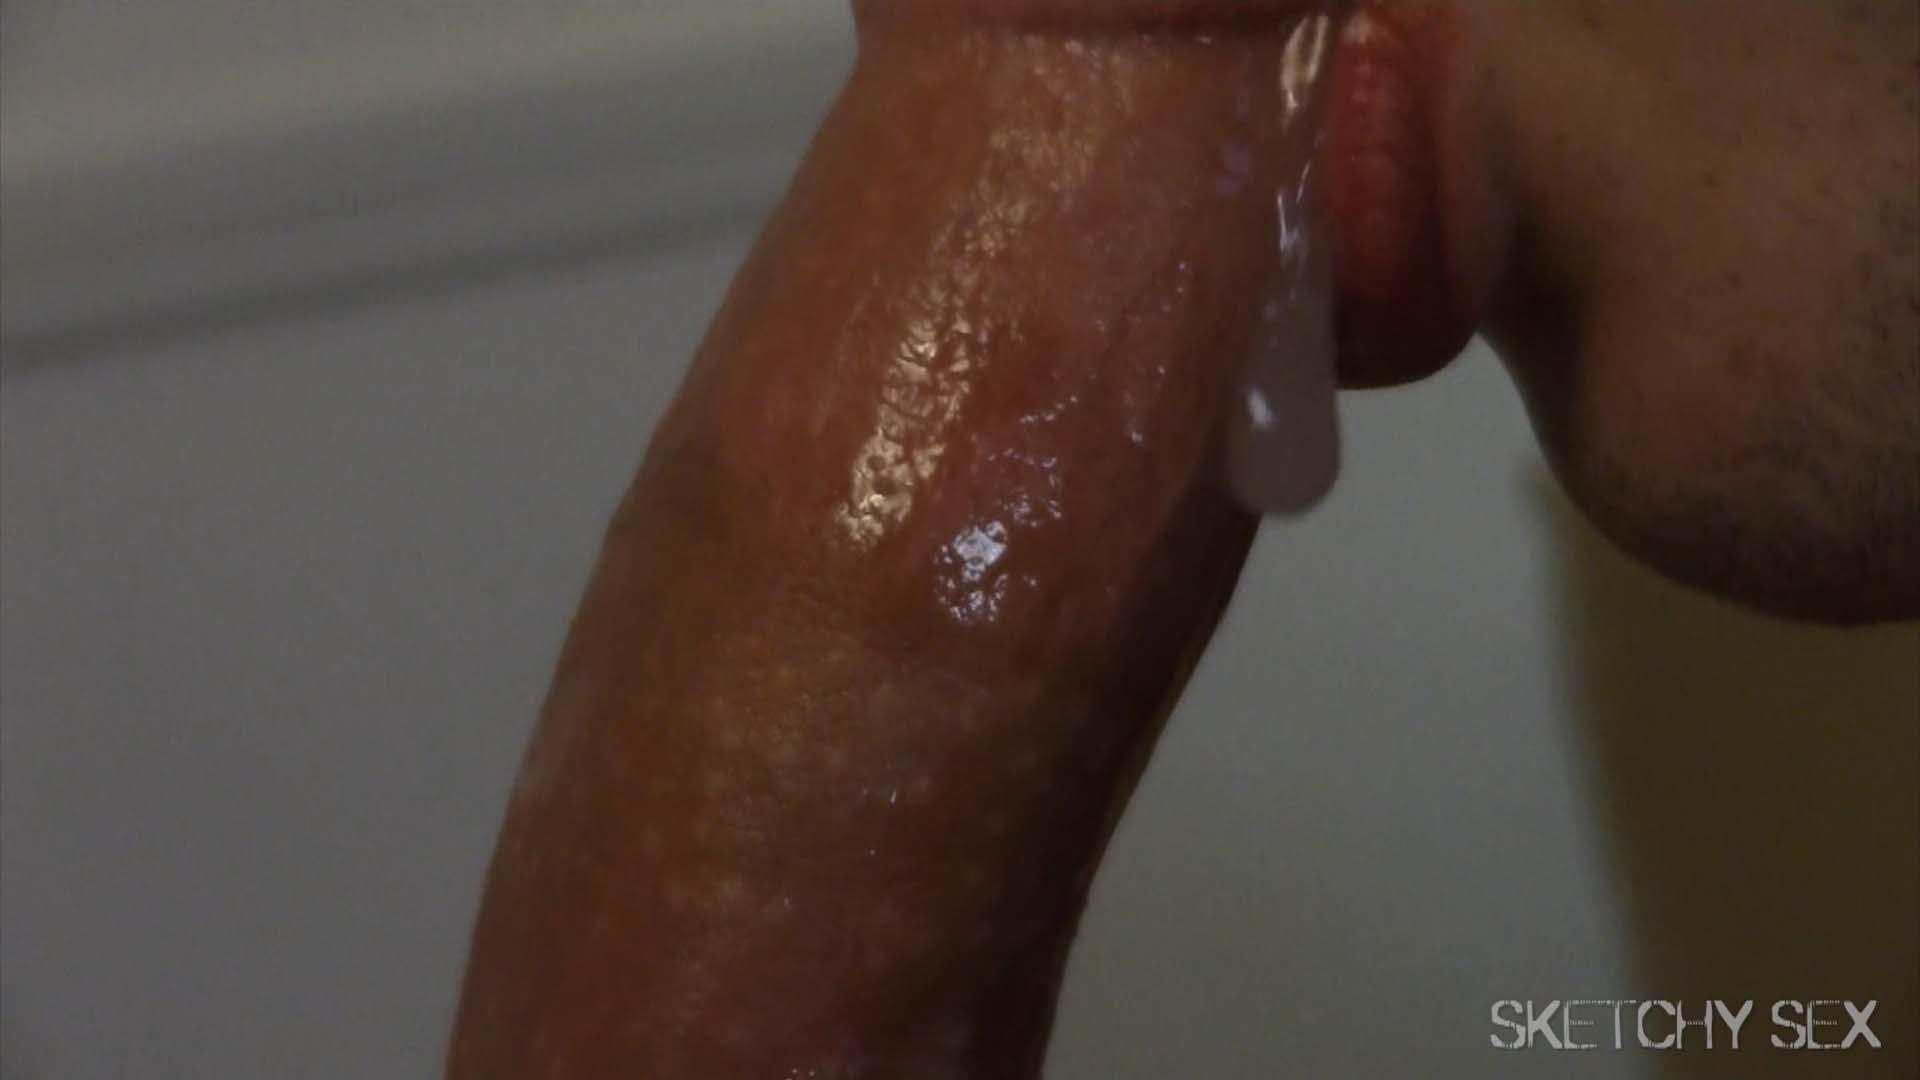 Sketchy Sex Bareback Sex Orgy Amateur Gay Porn 04